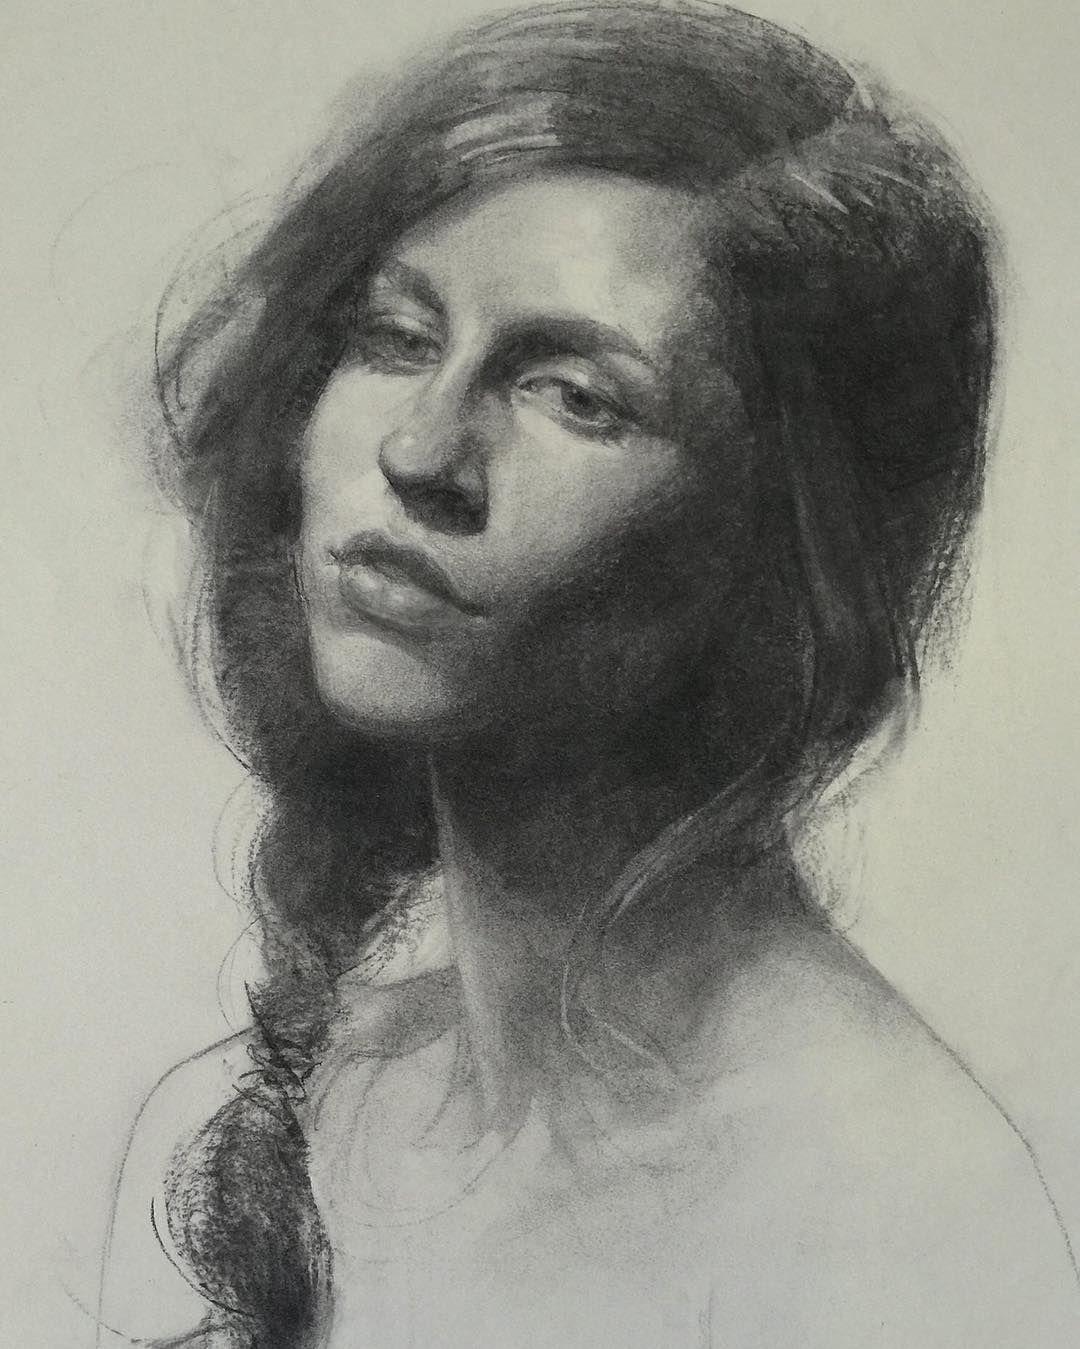 Vine charcoal drawing drawings draw artwork artist artists